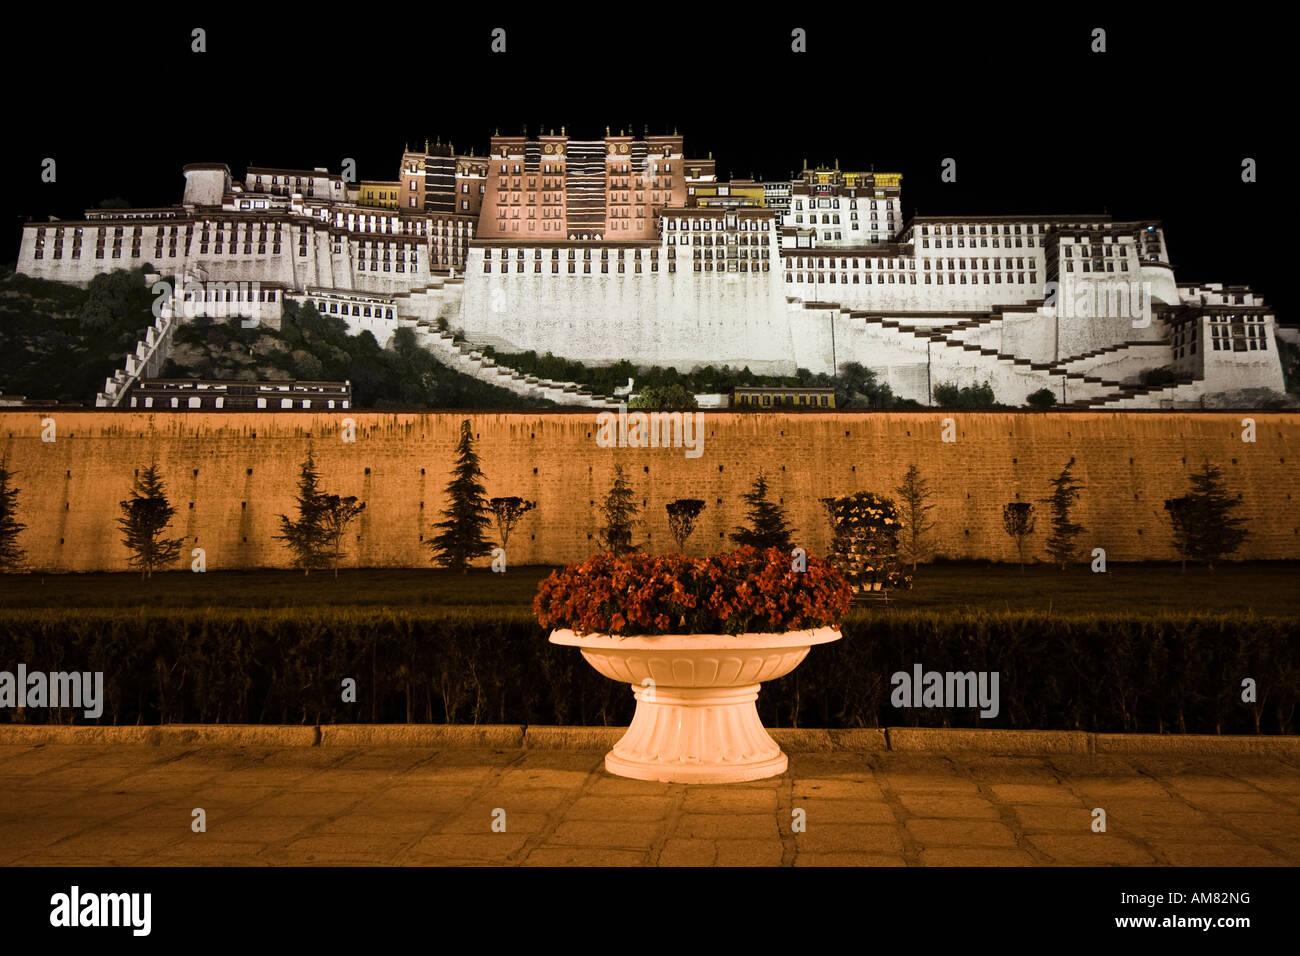 Potala Palace illuminated at night, Lhasa, Tibet - Stock Image